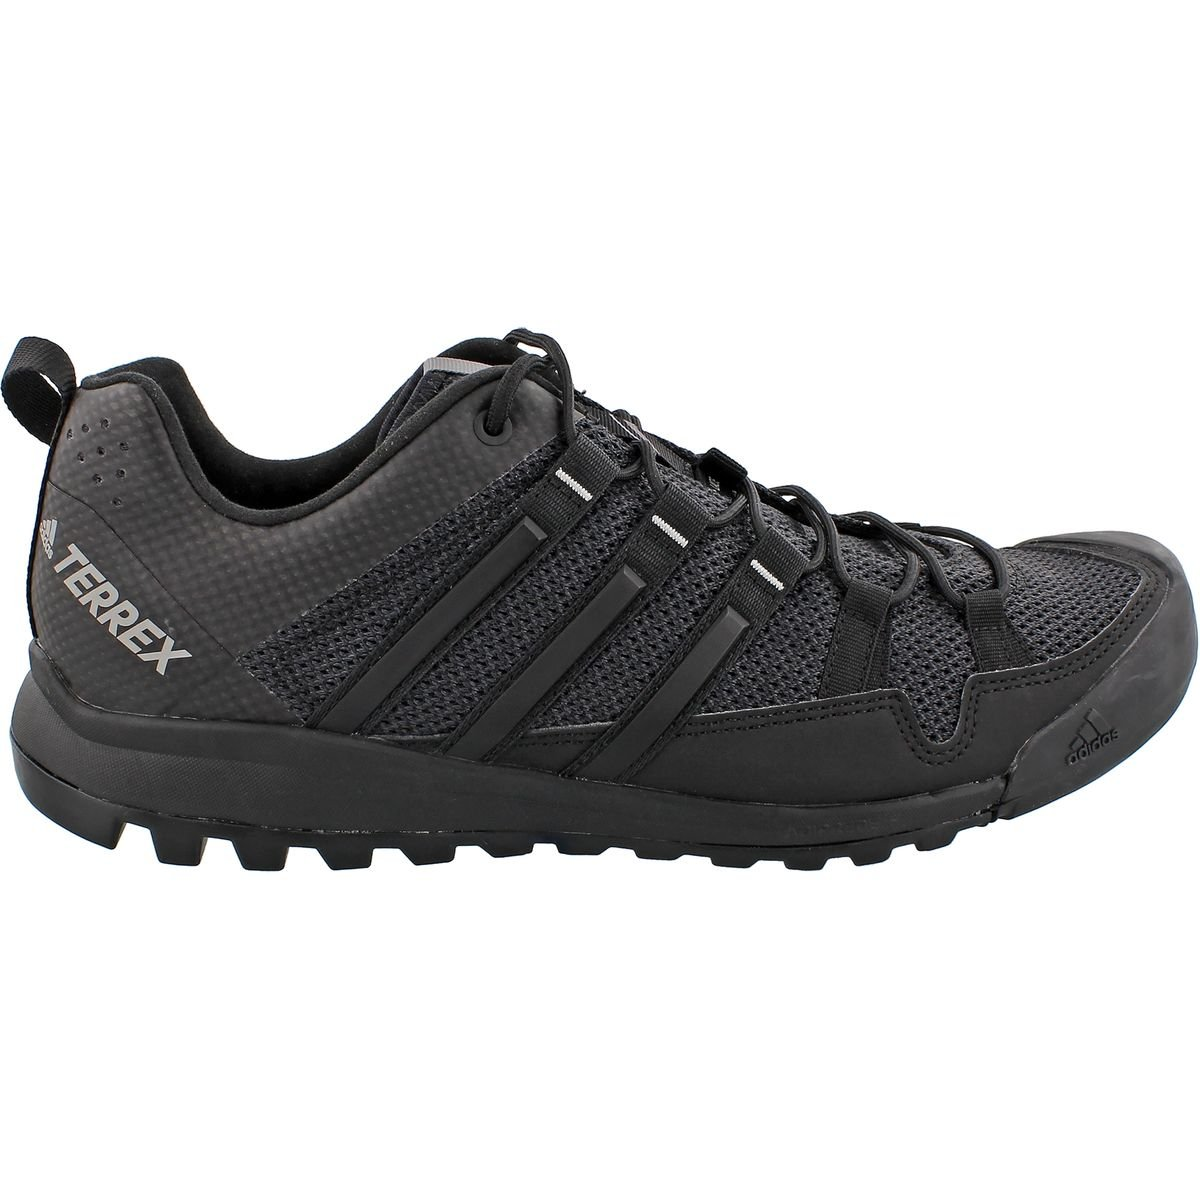 adidas Menƒ_Ts Terrex Solo Hiking/Running Shoes Grey/Black/Grey 8.5